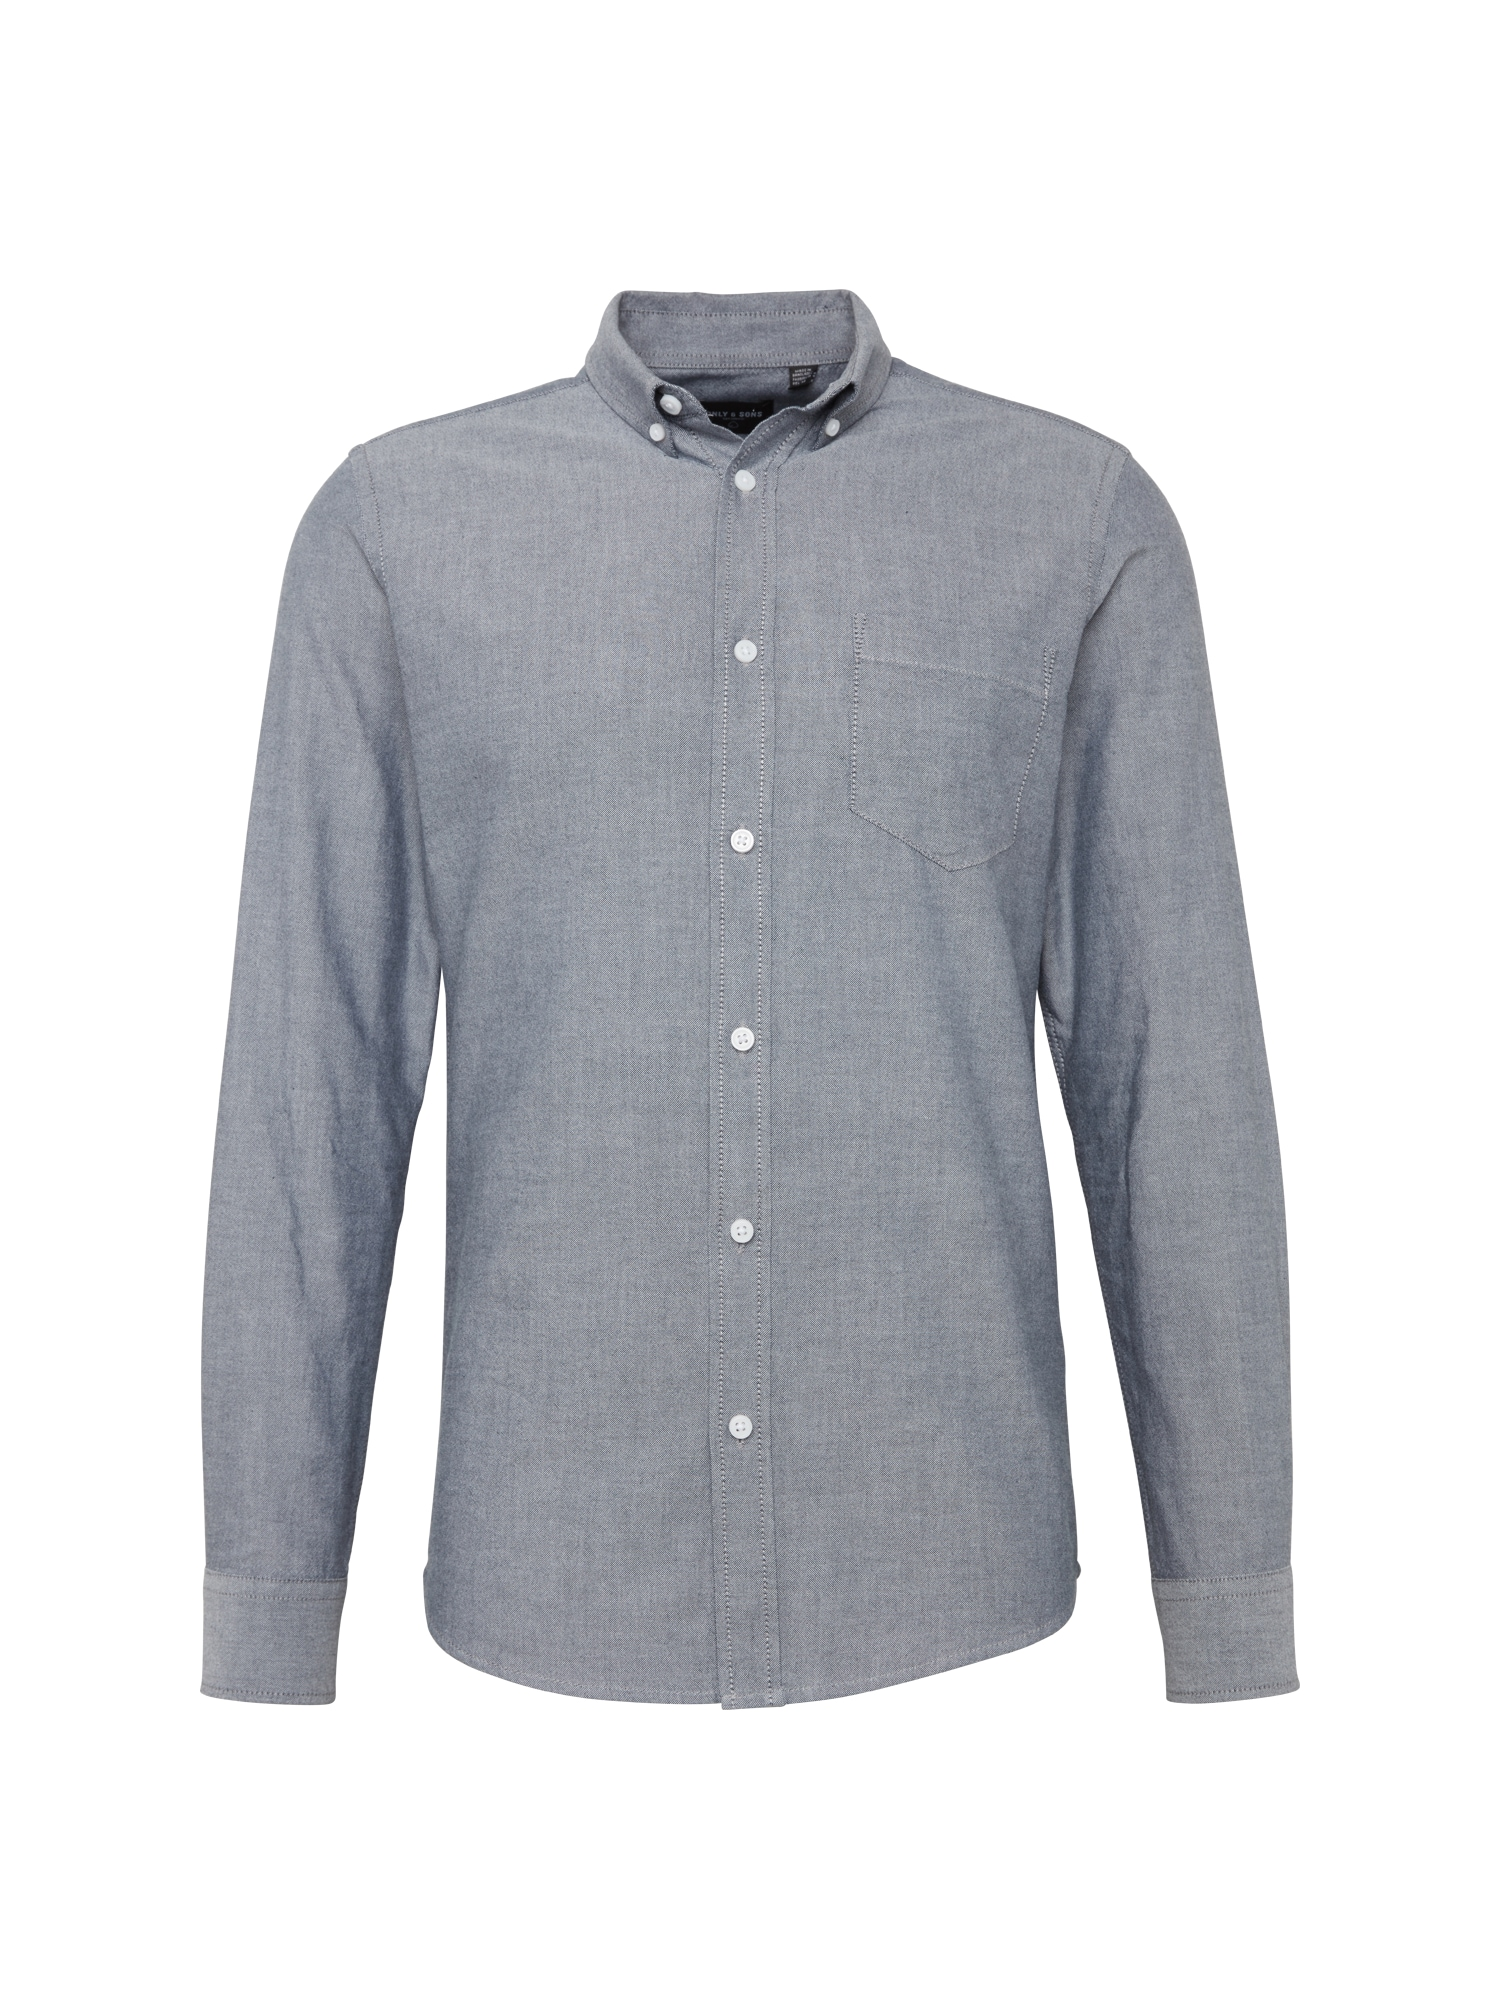 Košile ALVARO LS OXFORD SHIRT NOOS  šedá Only & Sons